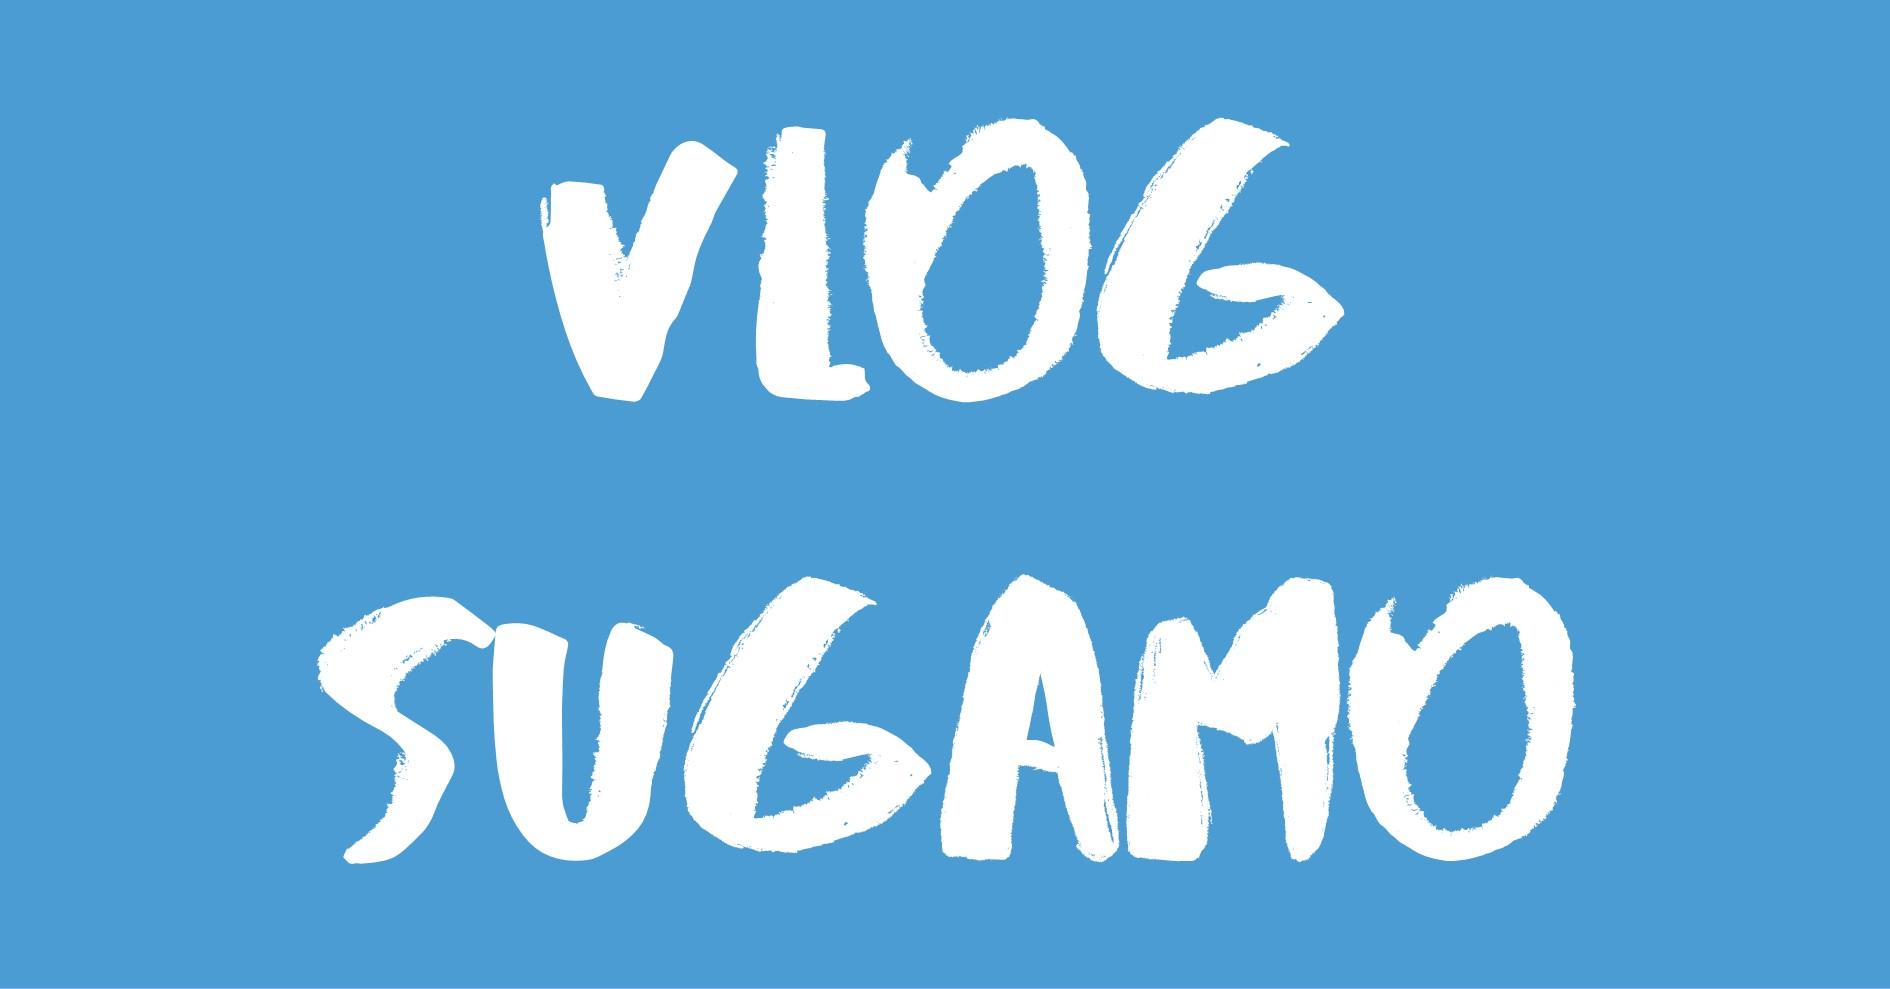 [Vlog] 巣鴨 / Sugamo